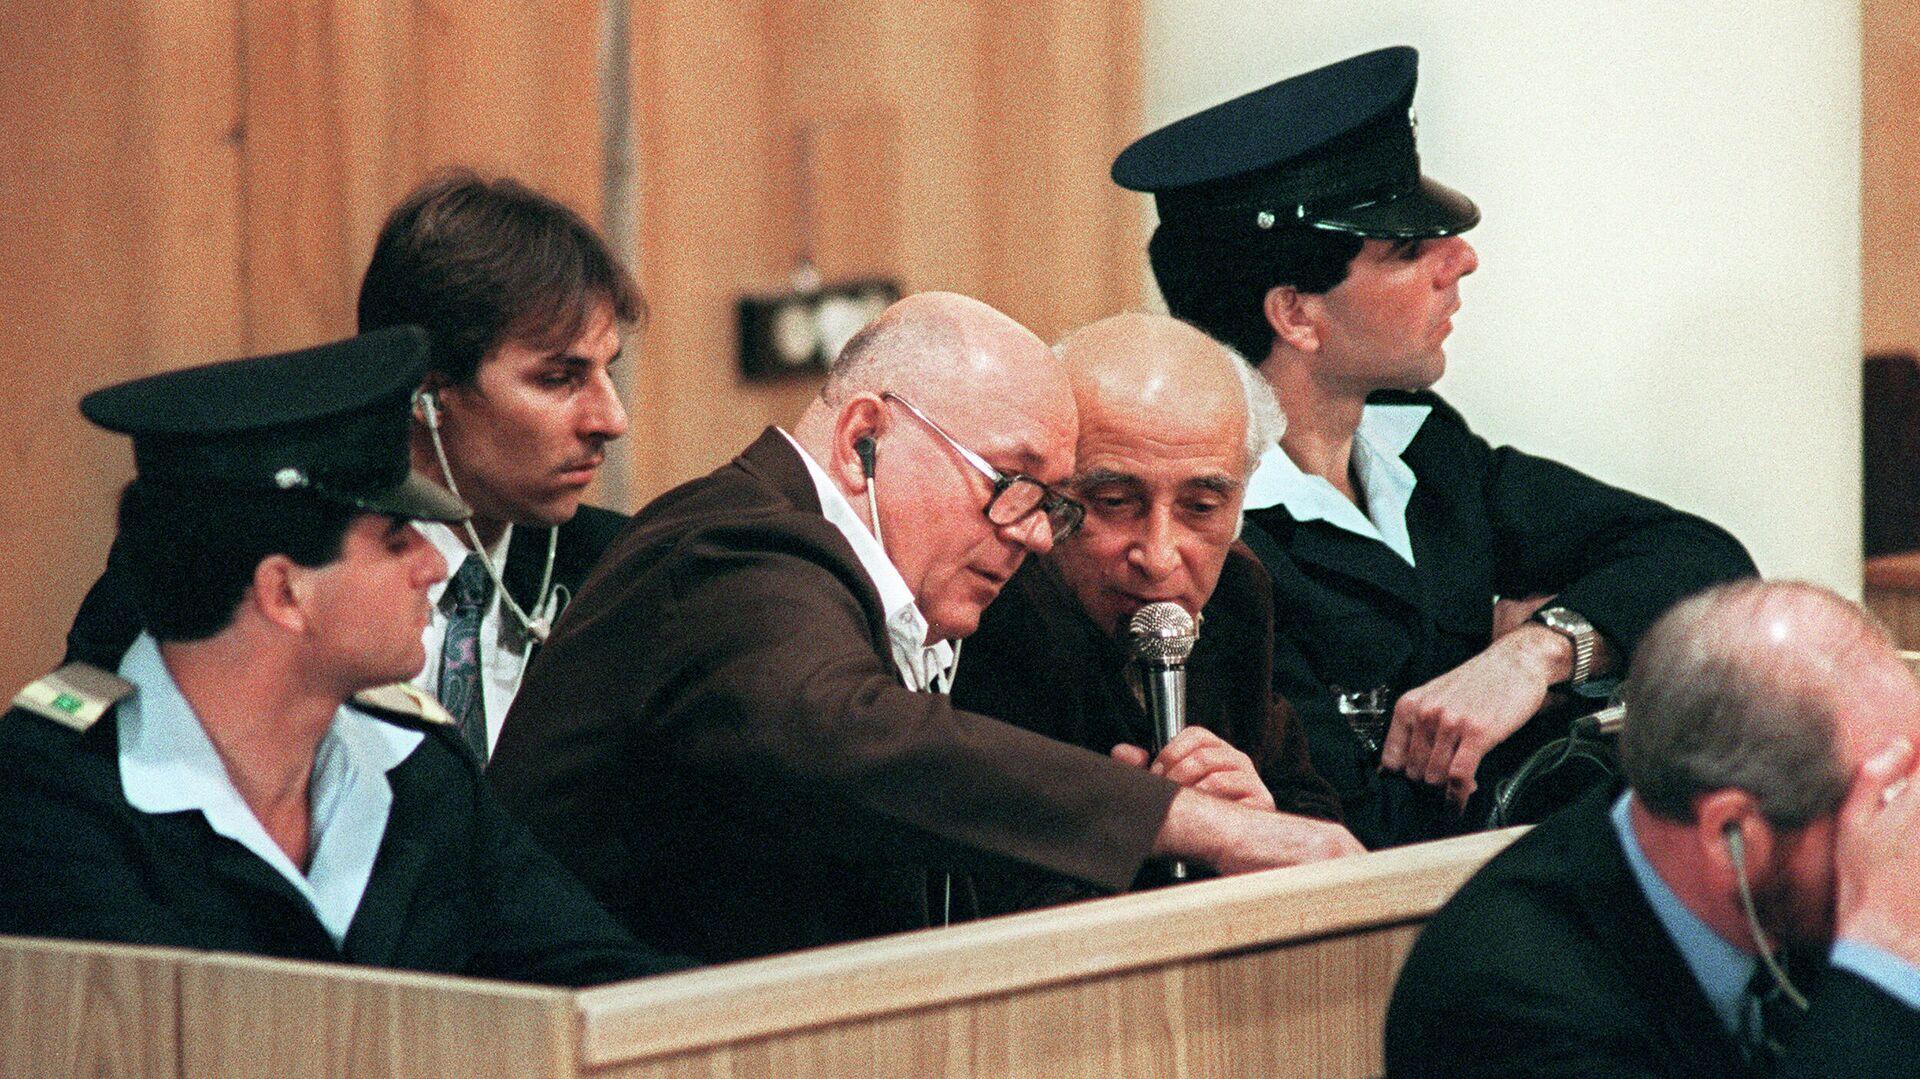 John Demjanjuk durante el juicio en Jerusalén - Sputnik Mundo, 1920, 16.03.2021